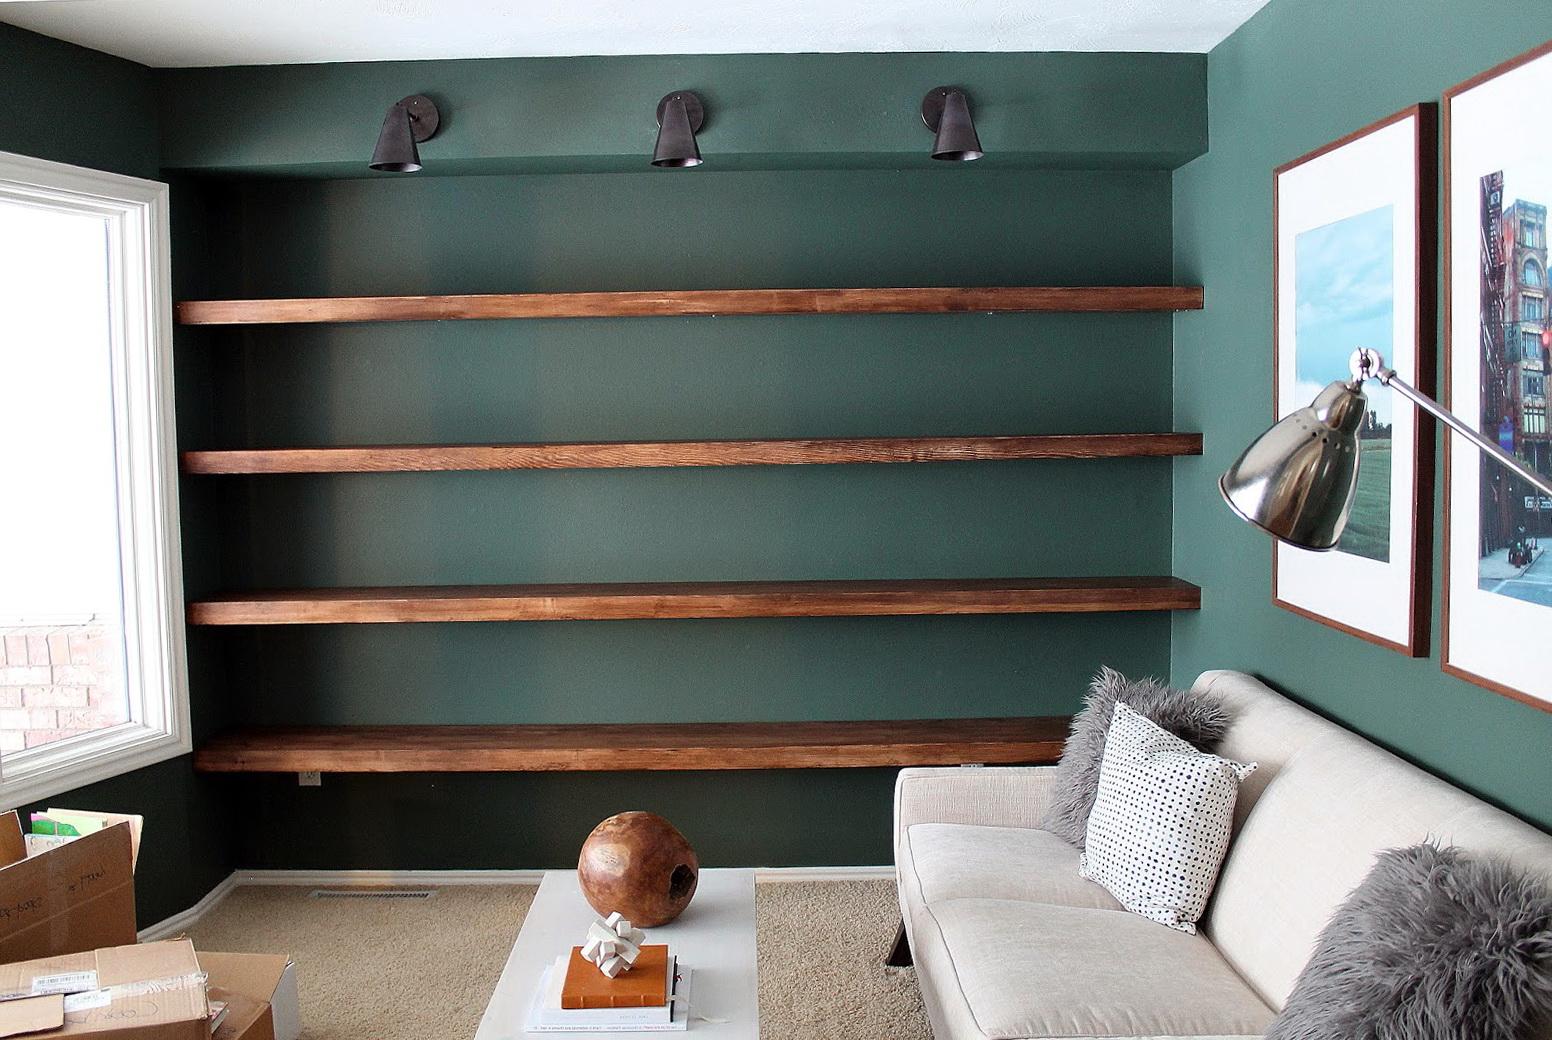 Wood Wall Shelves For Books